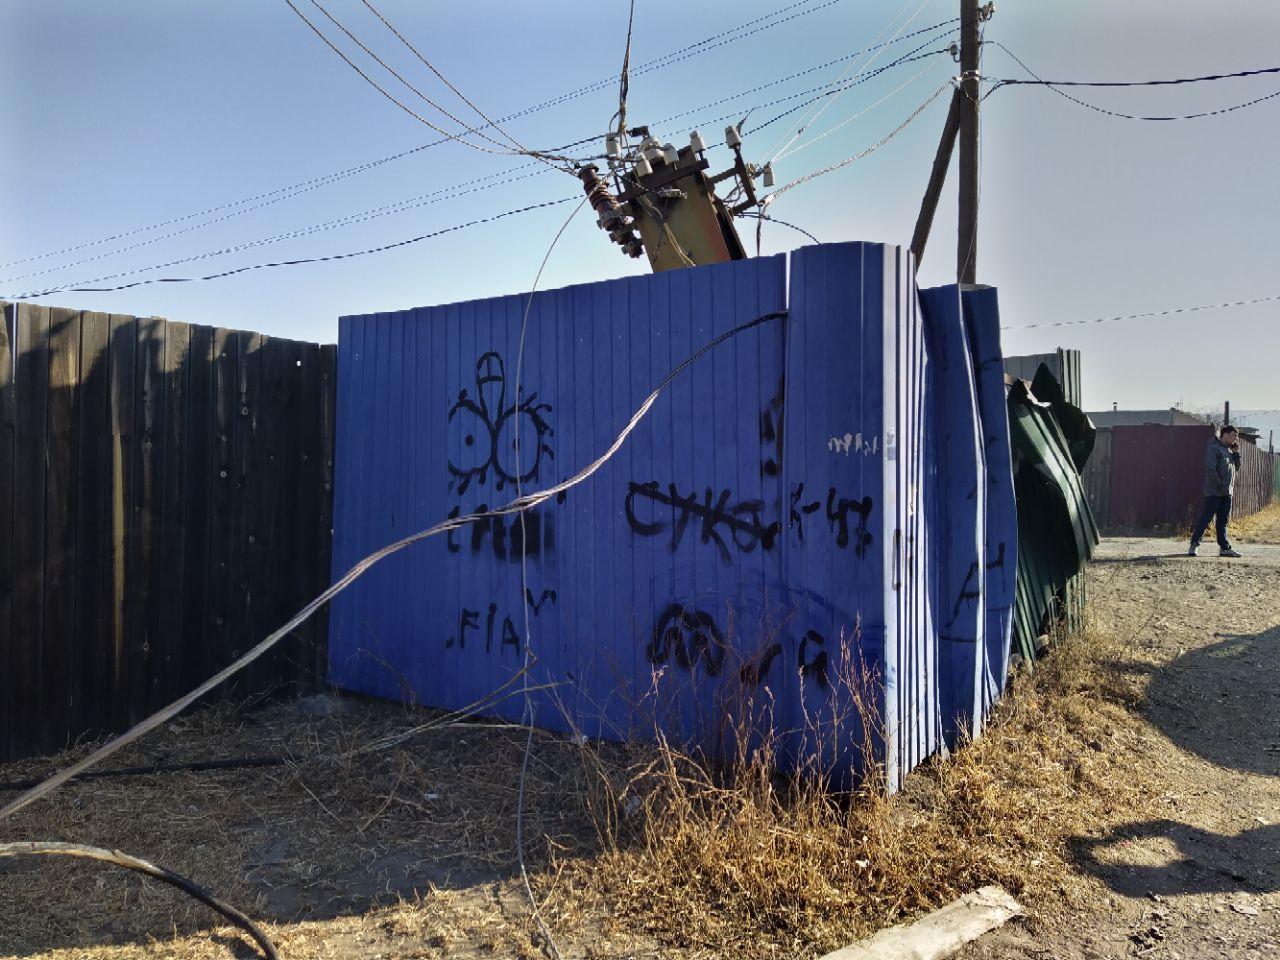 Жители СНТ «Сигнал» до сих пор сидят без света — ремонтников на месте нет